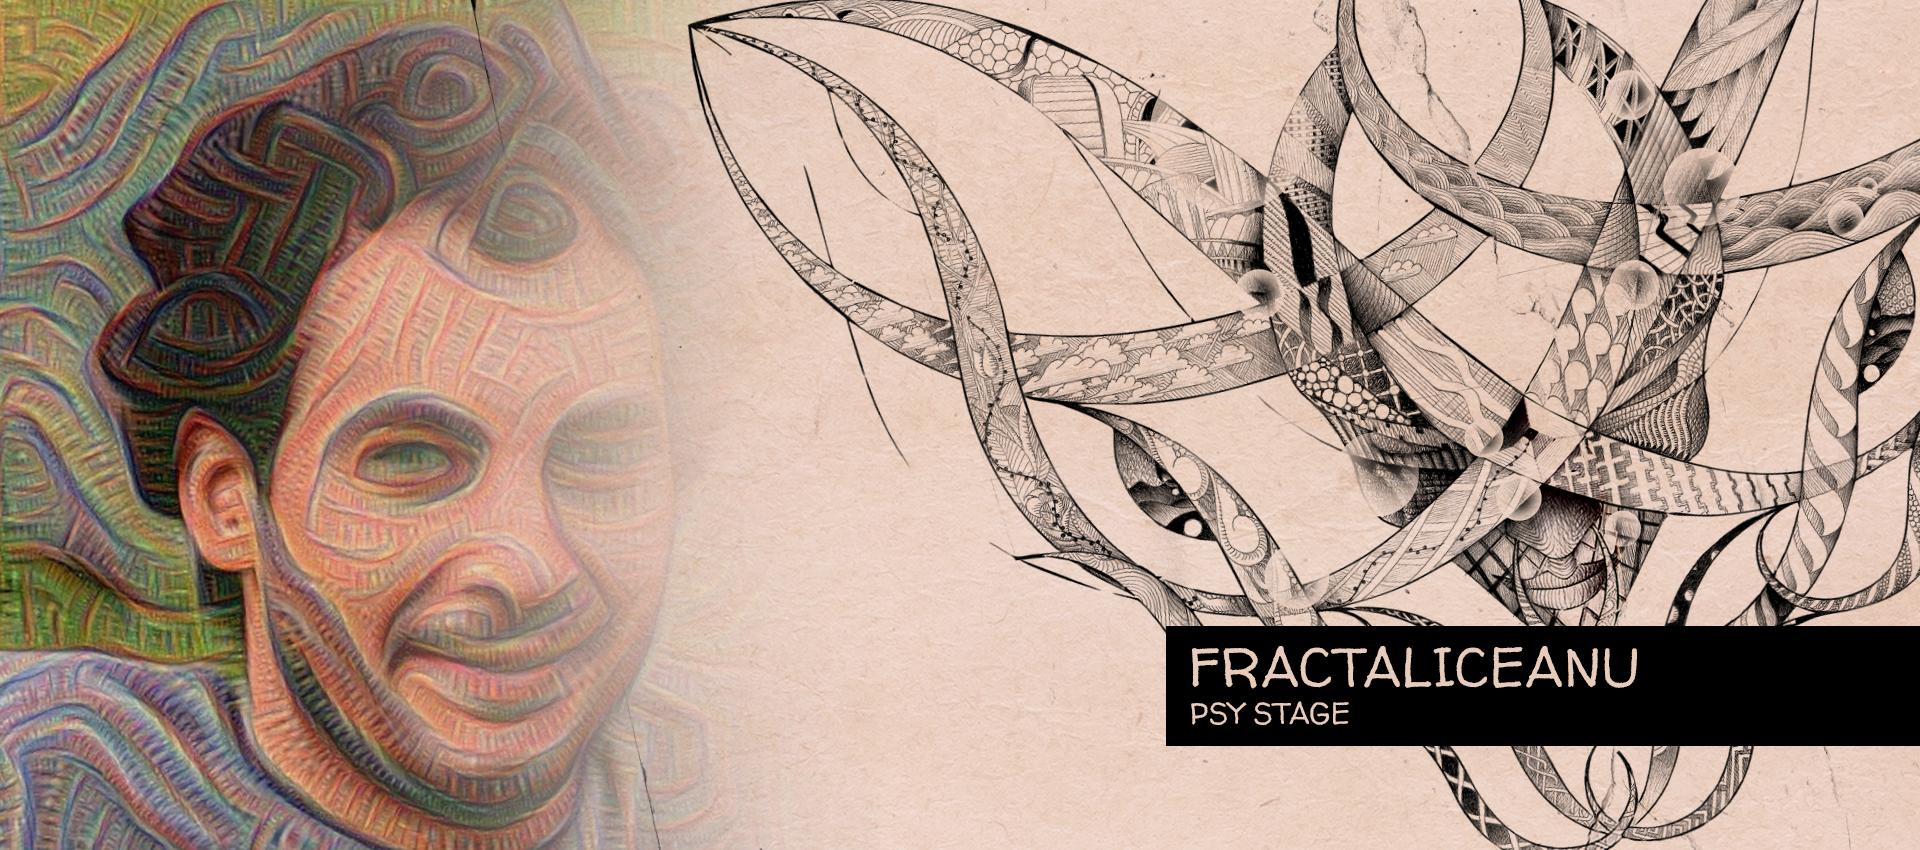 Fractaliceanu